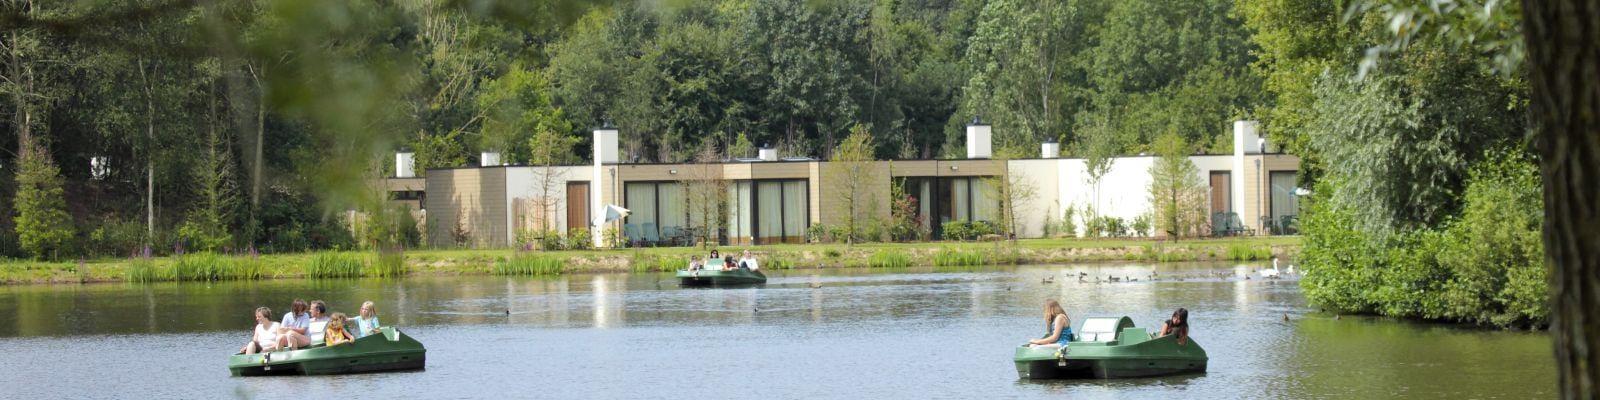 bungalowrace meer